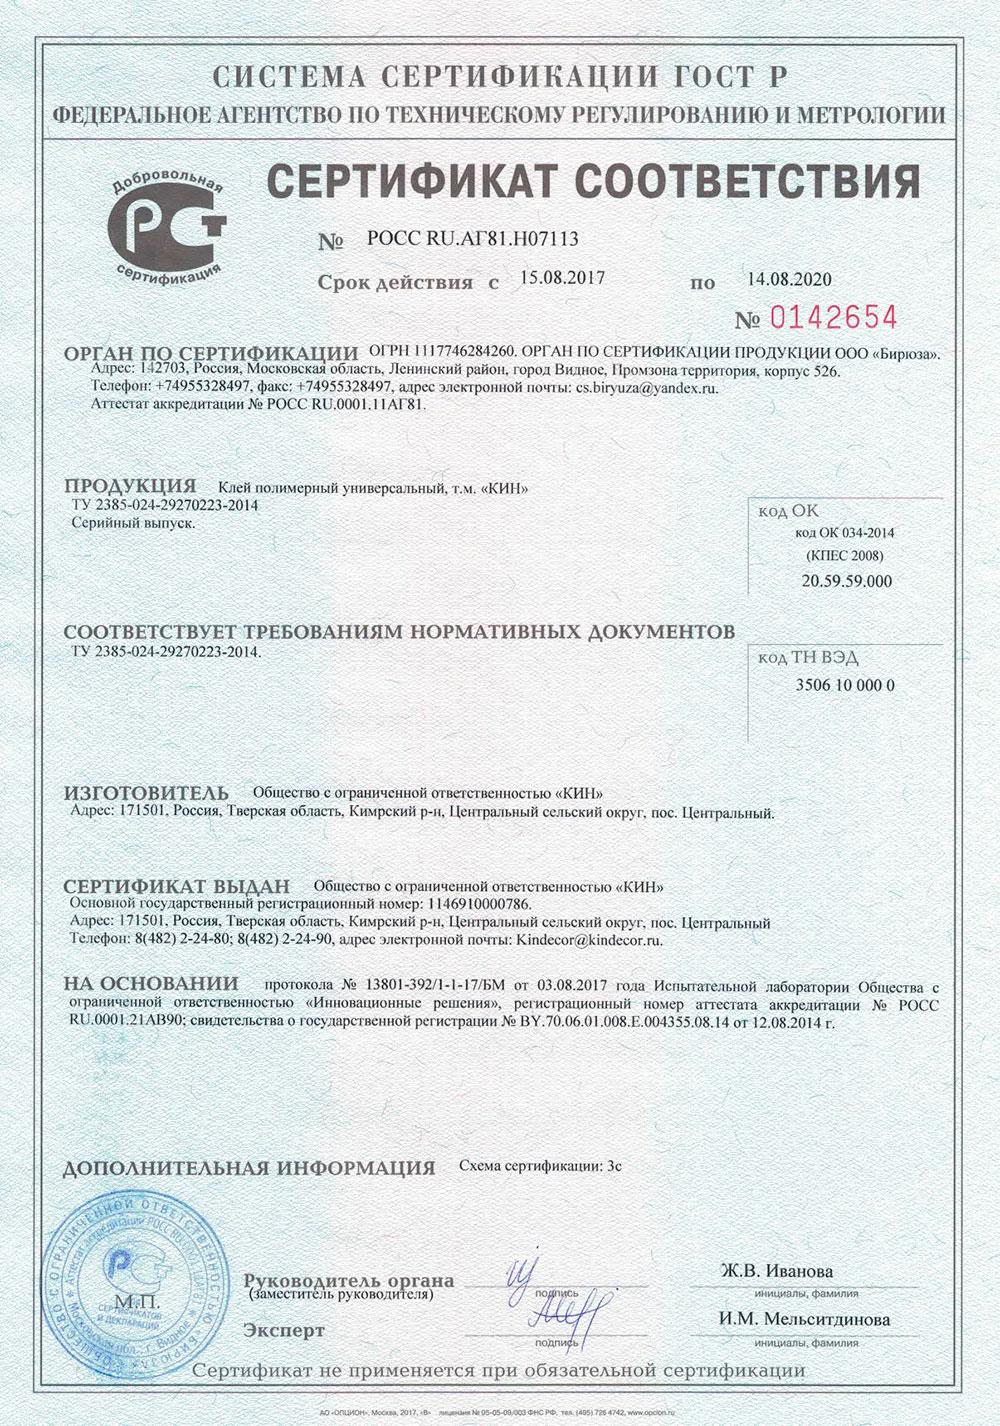 Сертификация красок и лаков мытищи itil сертификация москва